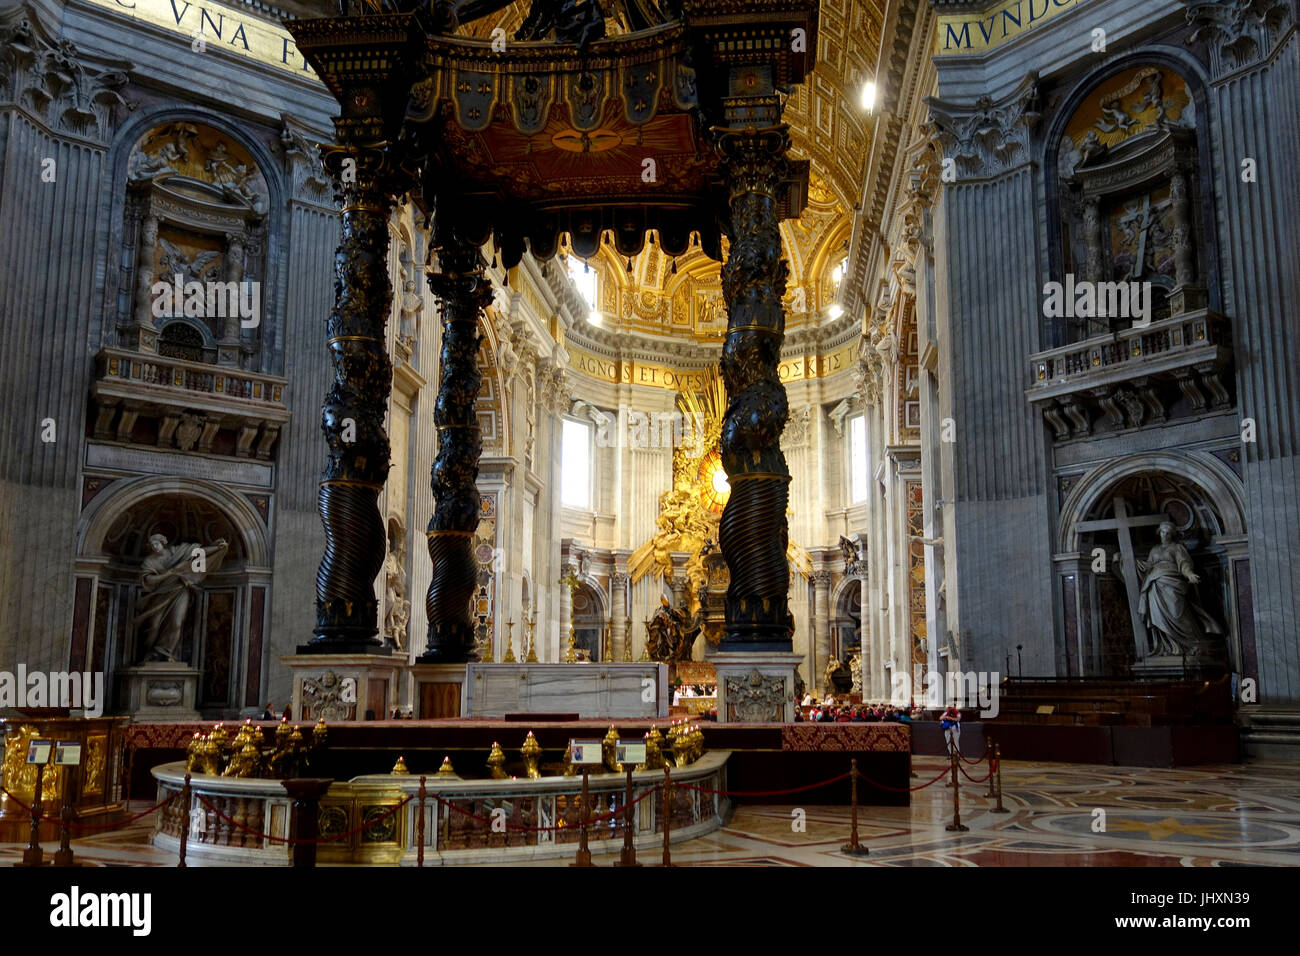 http://c8.alamy.com/compde/jhxn39/interieur-petersdom-rom-italien-jhxn39.jpg